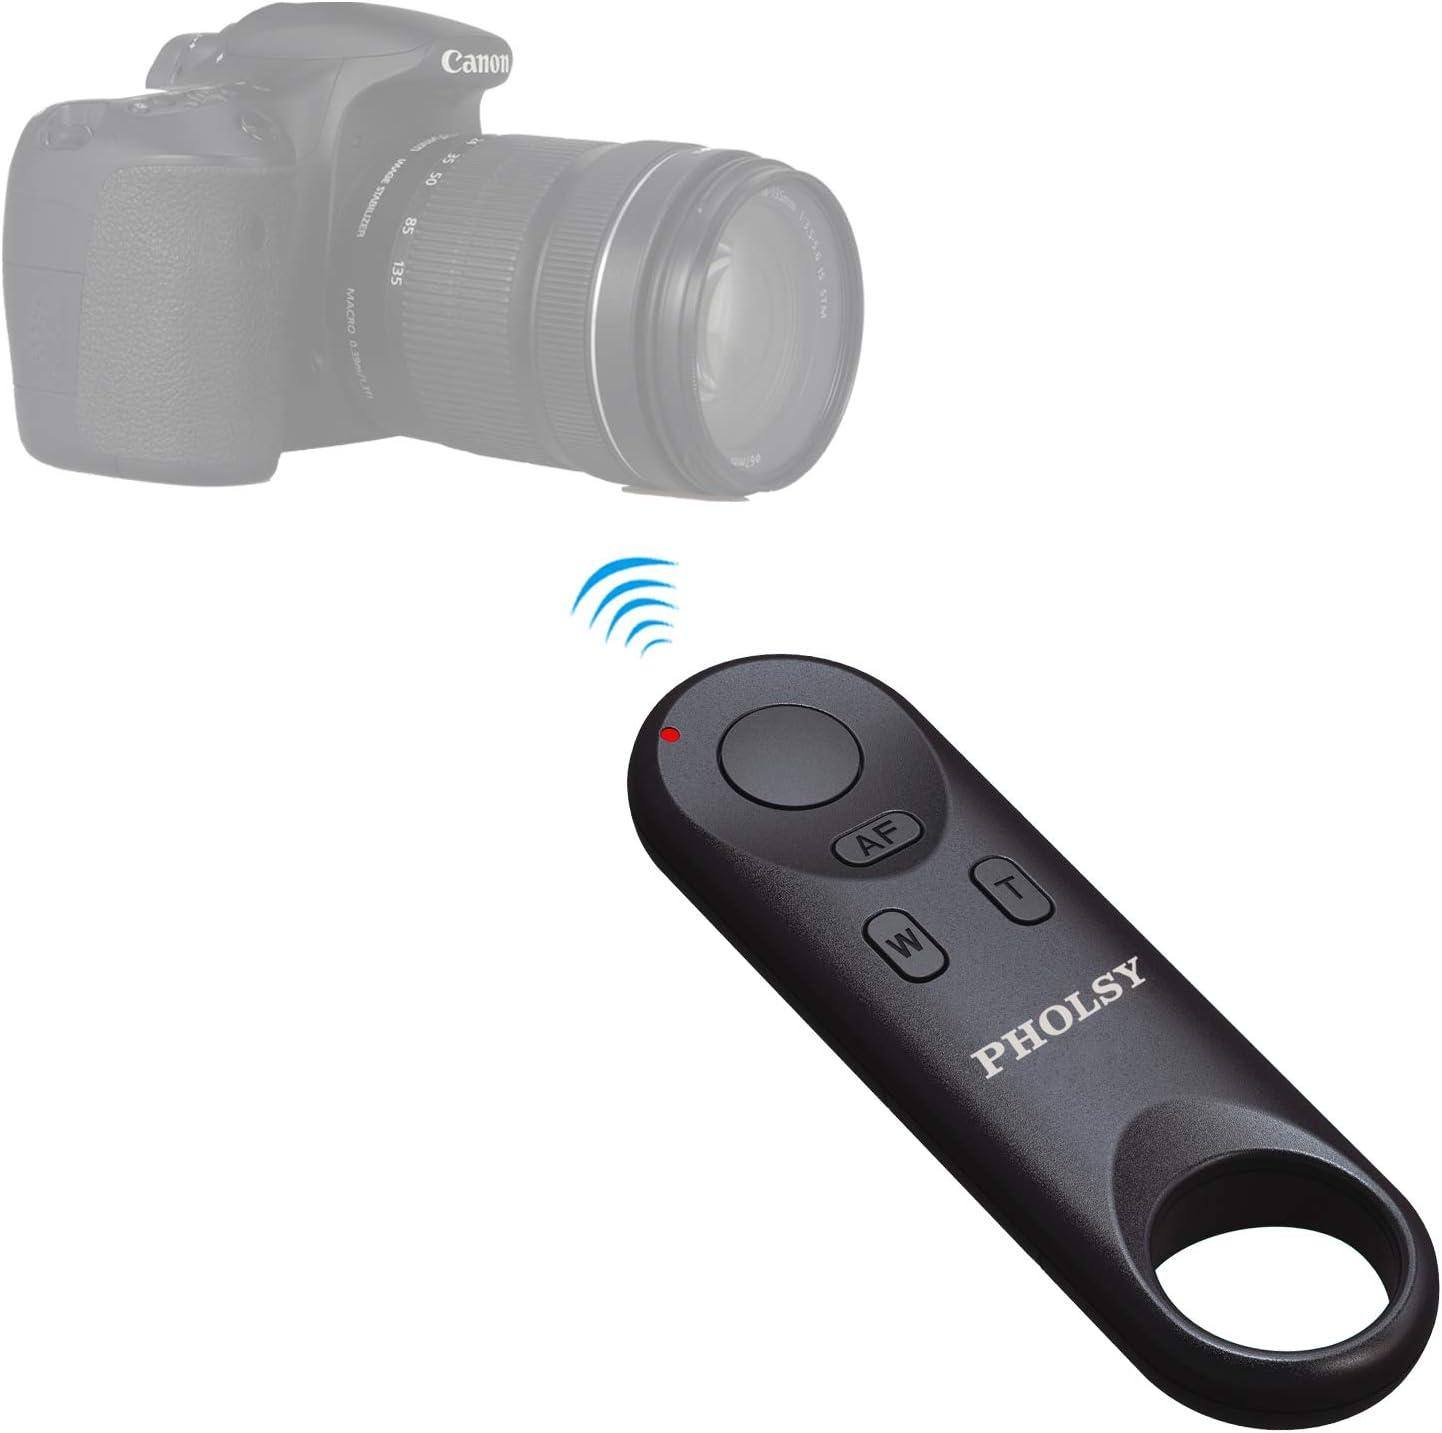 1x Conrol remoto para Canon EOS 800D M6 77D